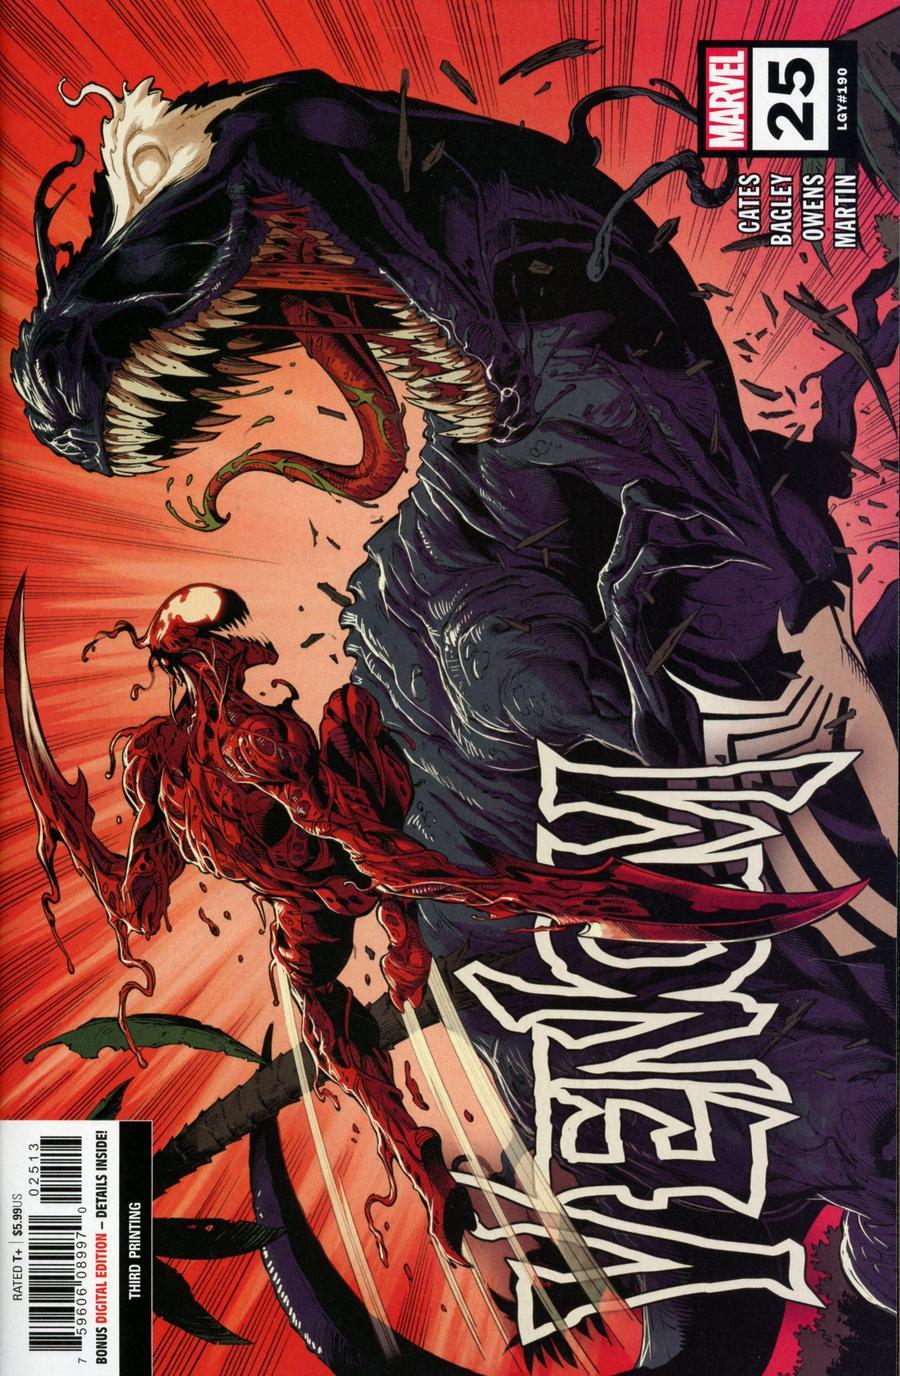 Venom Vol 4 #25 Cover S 3rd Ptg Mark Bagley Variant Cover